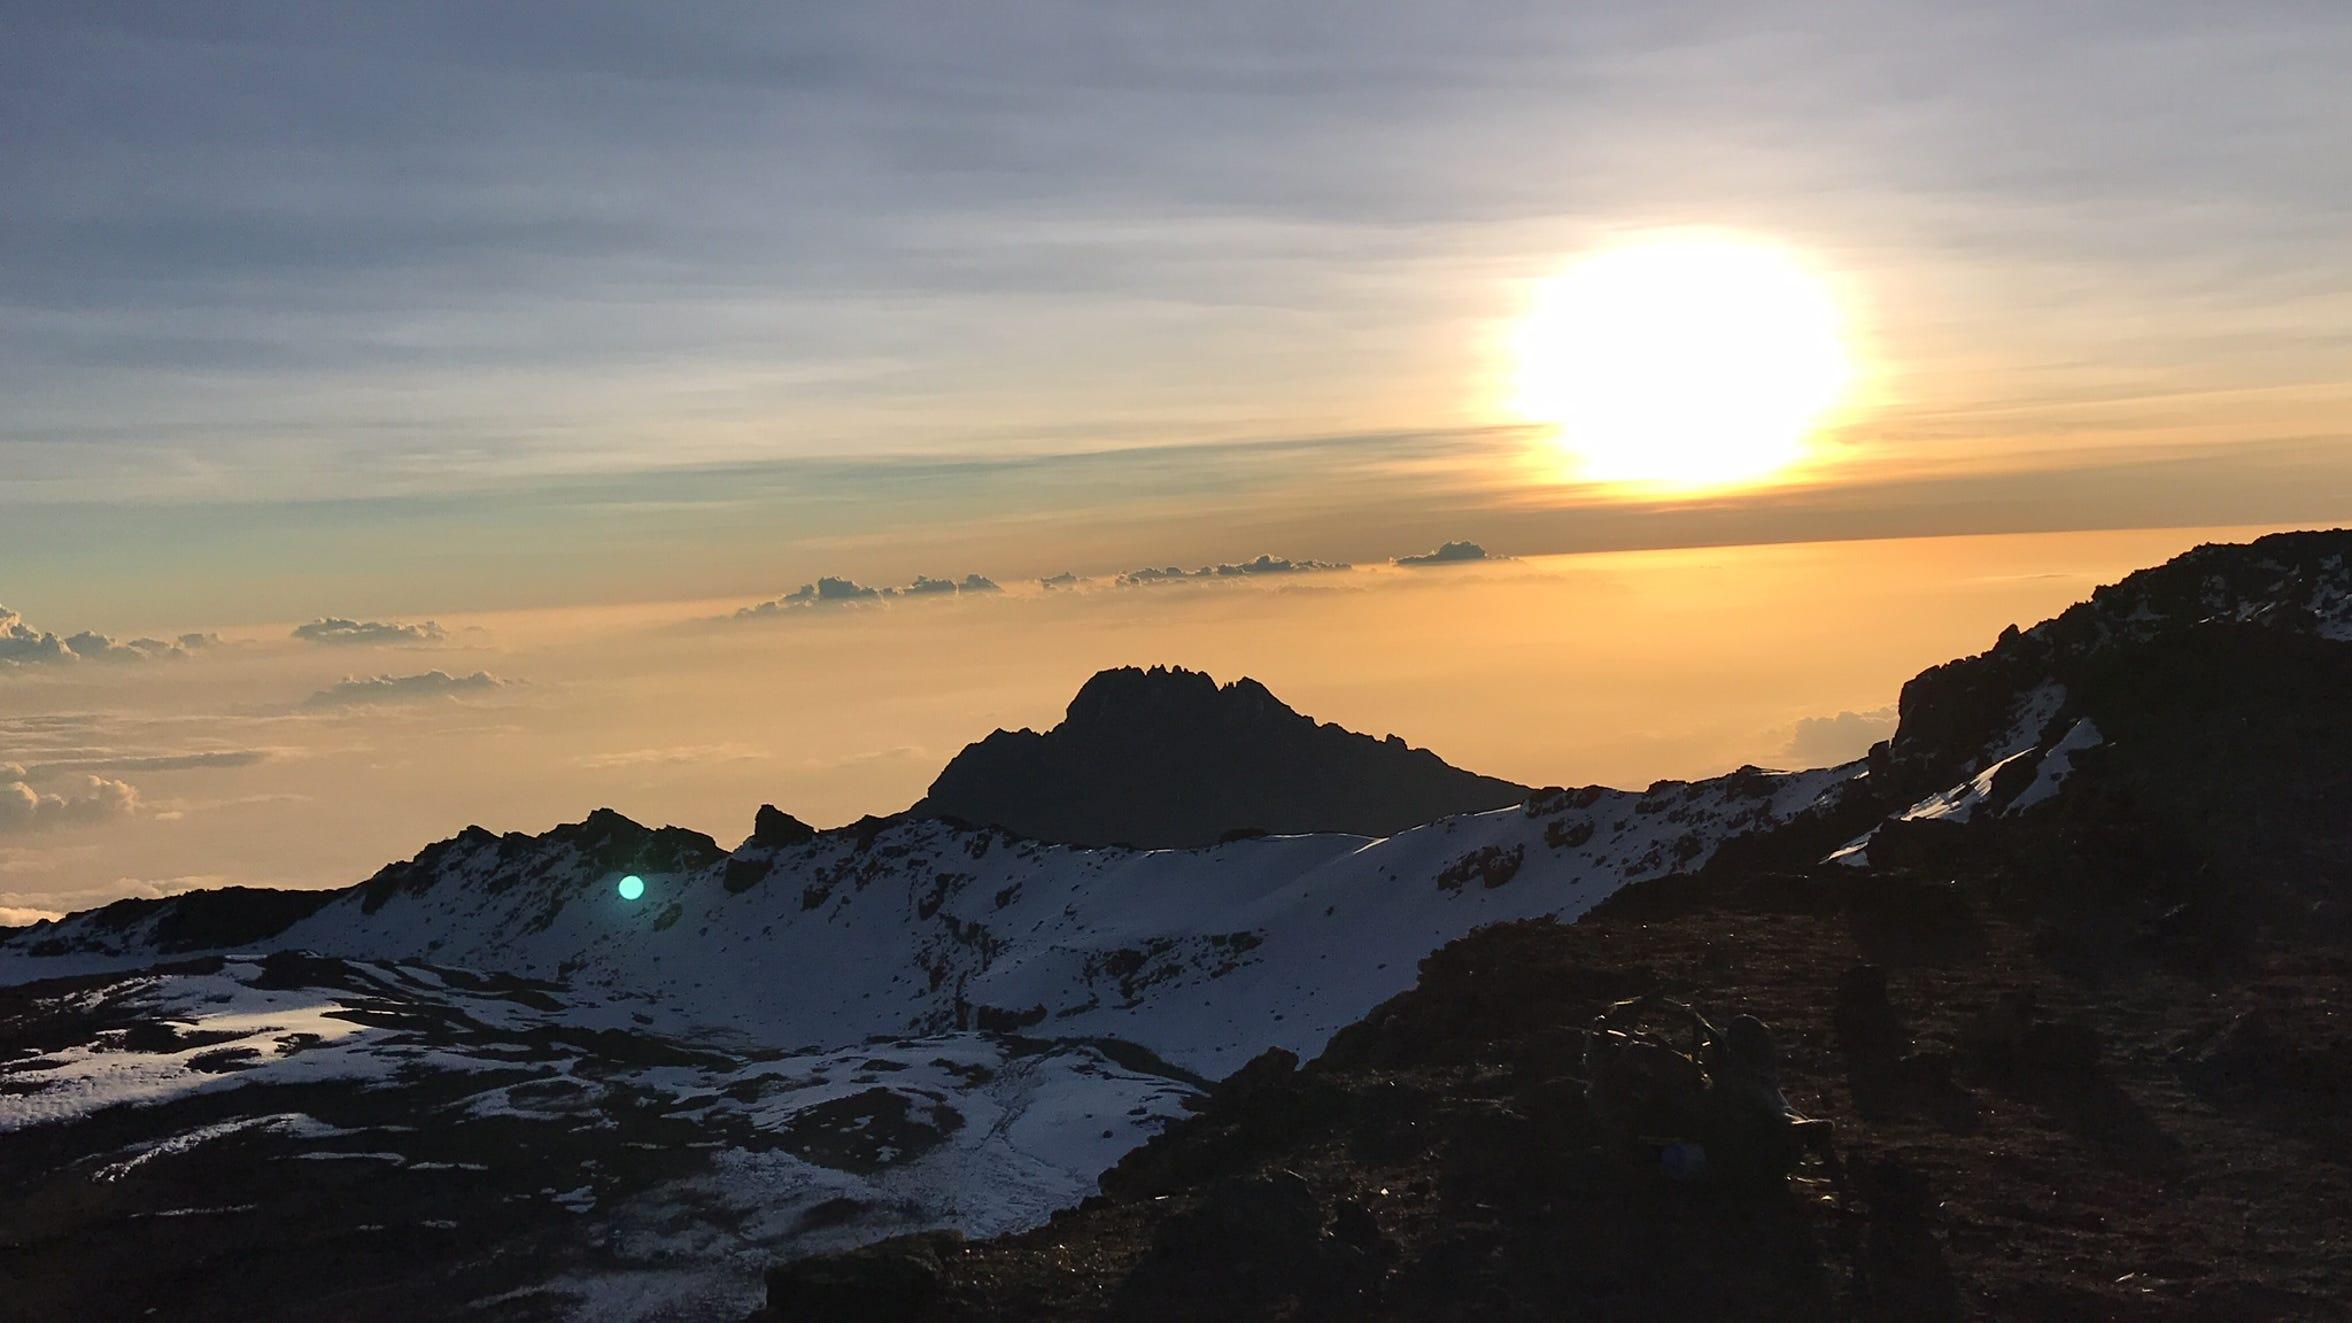 Sunrise from the summit of Kilimanjaro, Tanzania